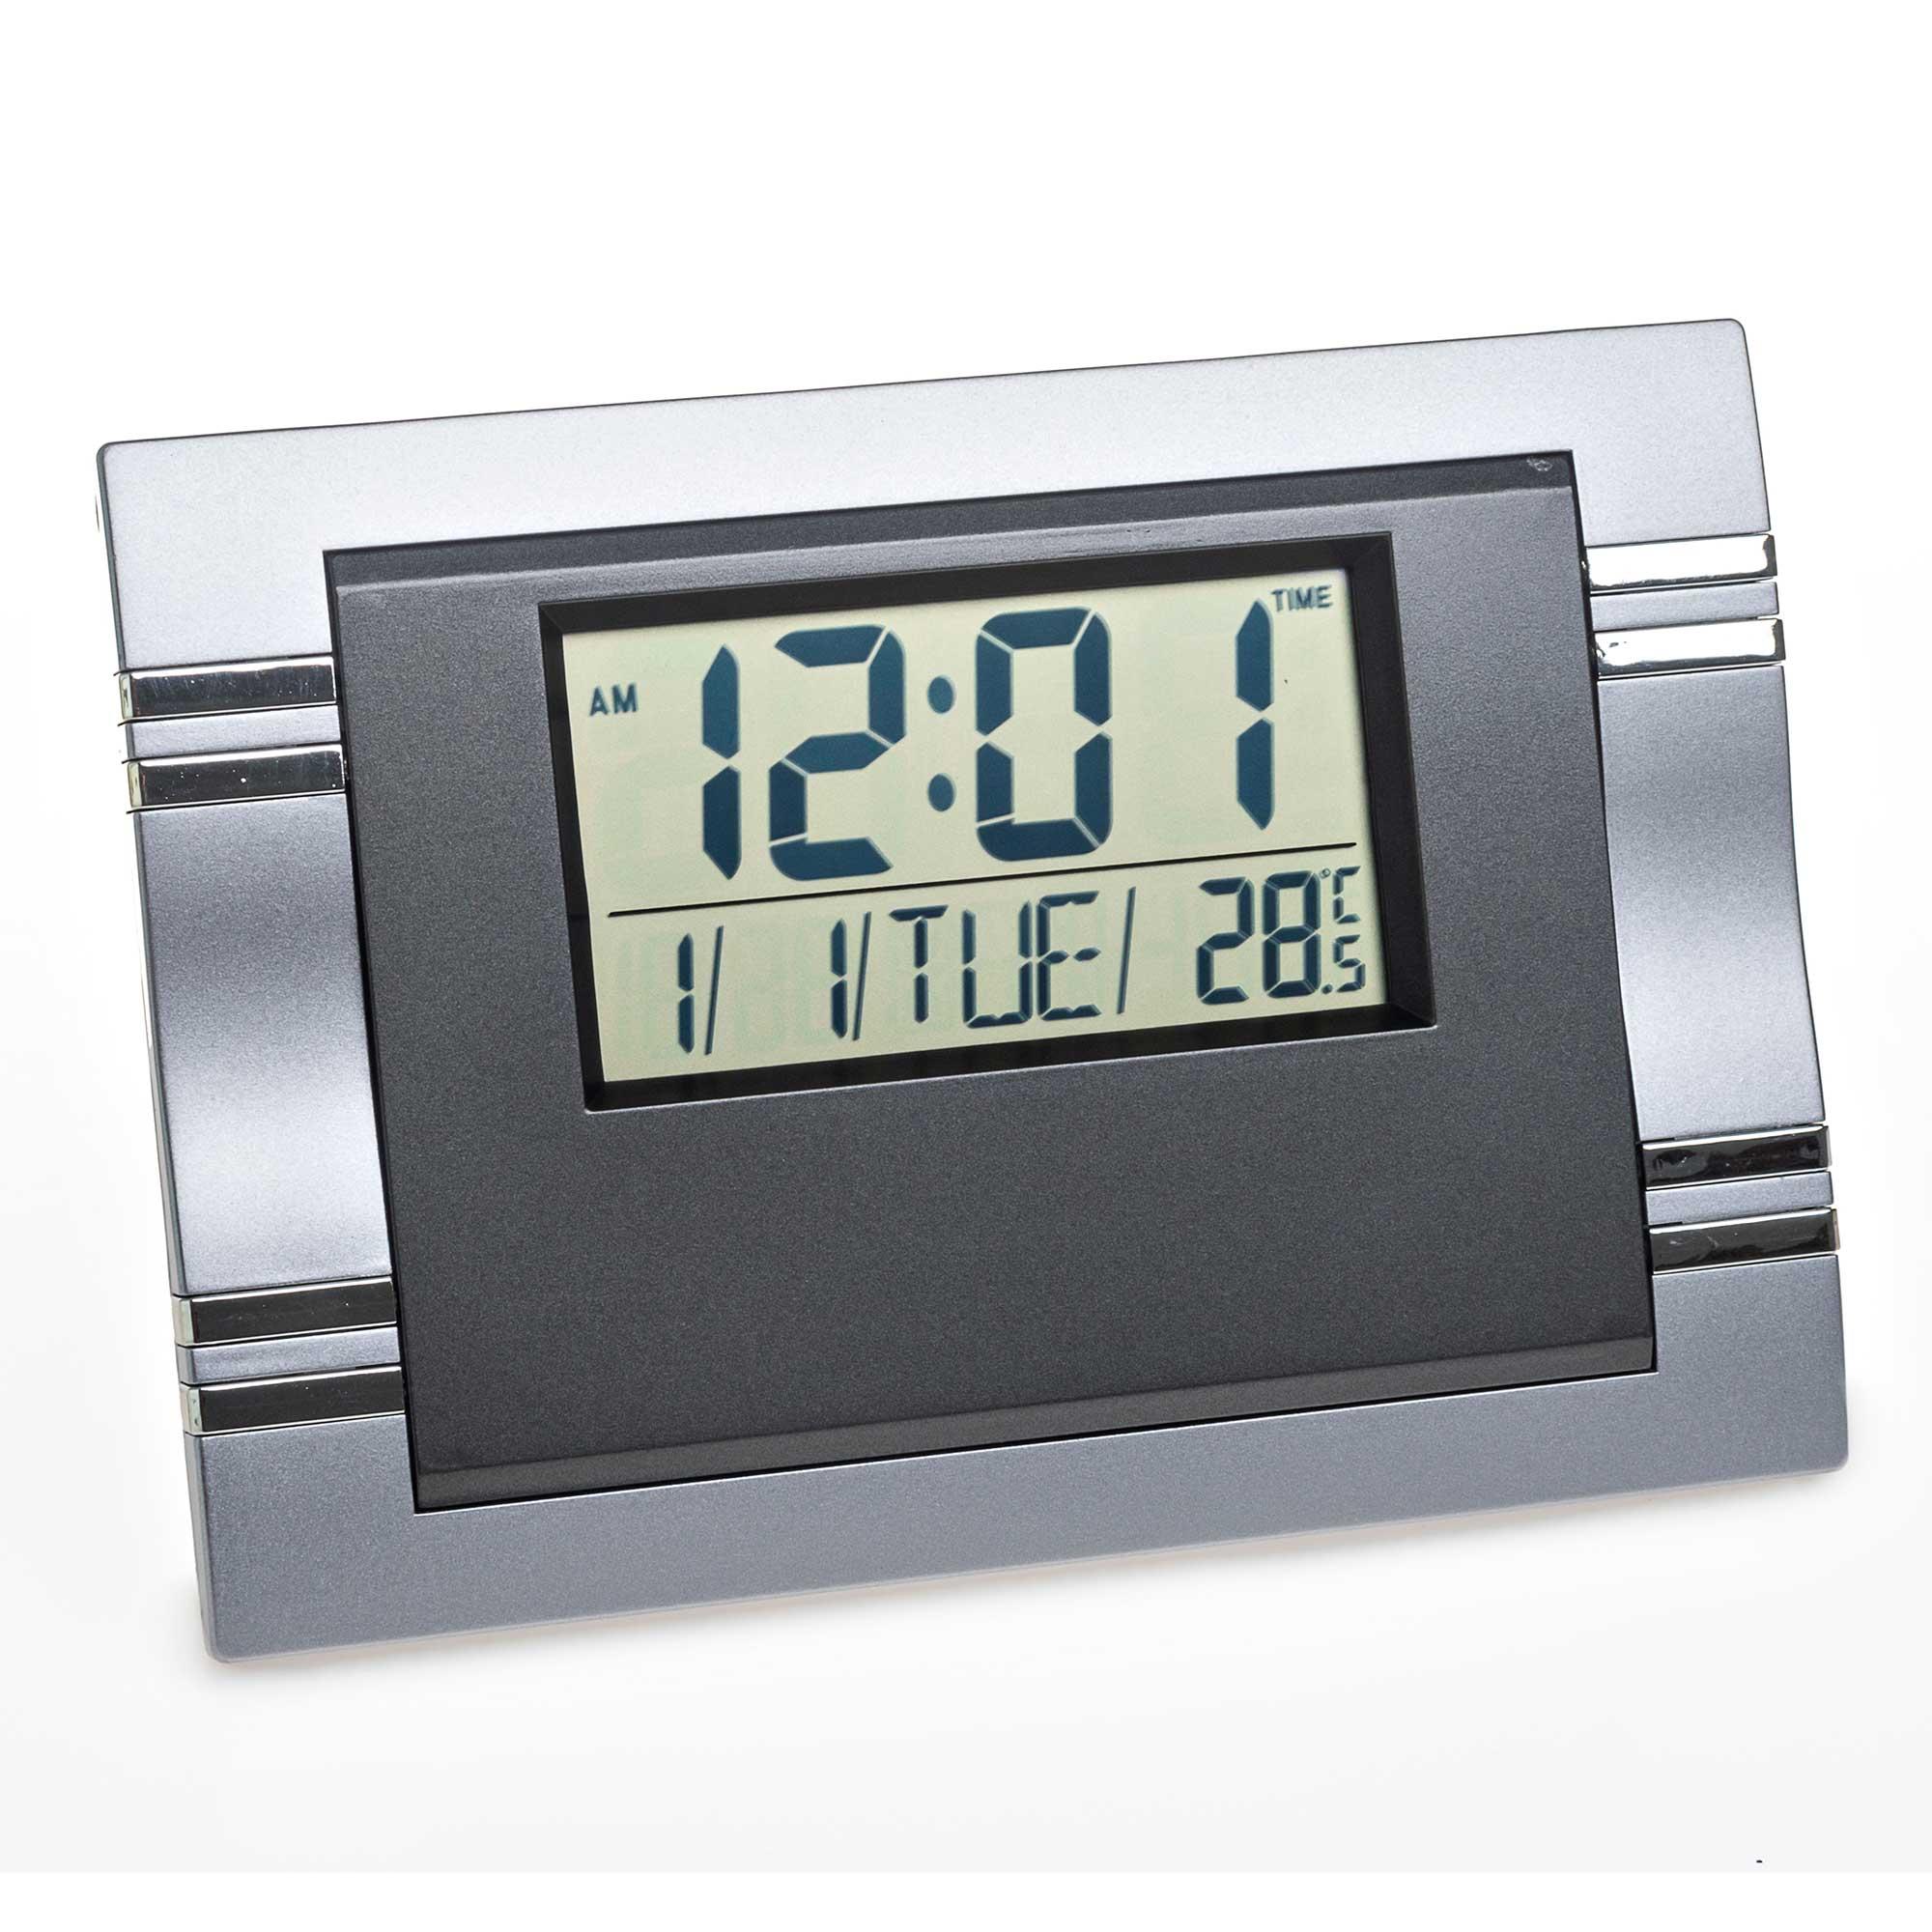 Relógio Despertador de Parede Mesa Digital Data Temperatura MJ6605